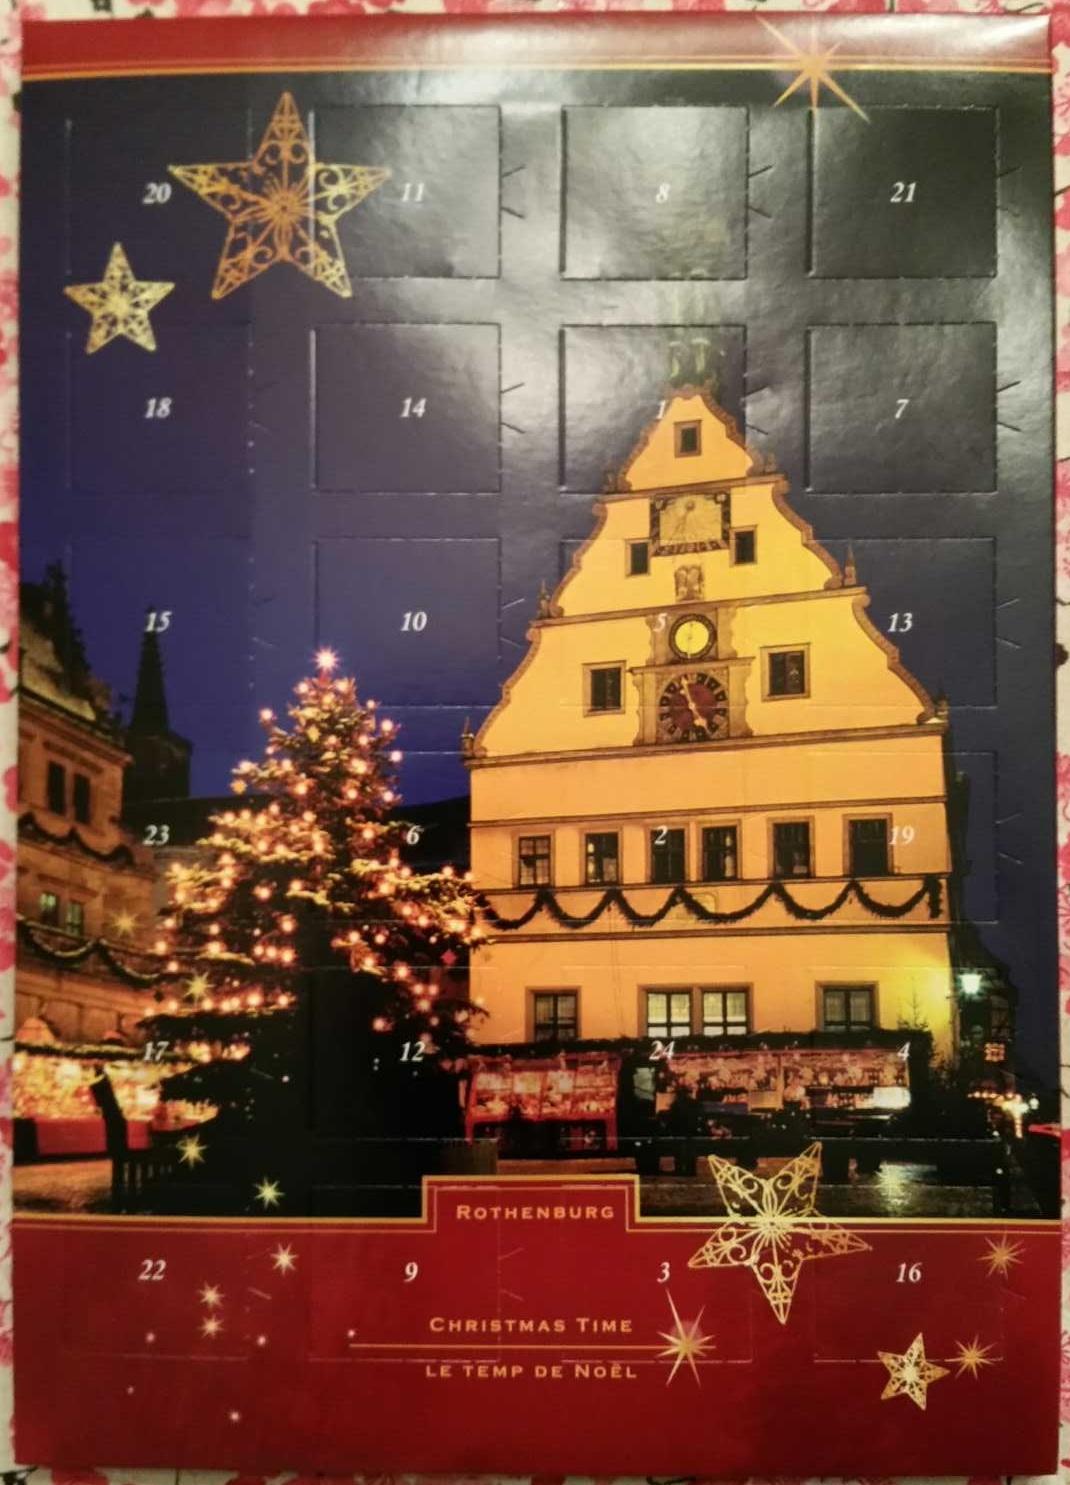 Rothenburg Christmas Time - Produit - fr